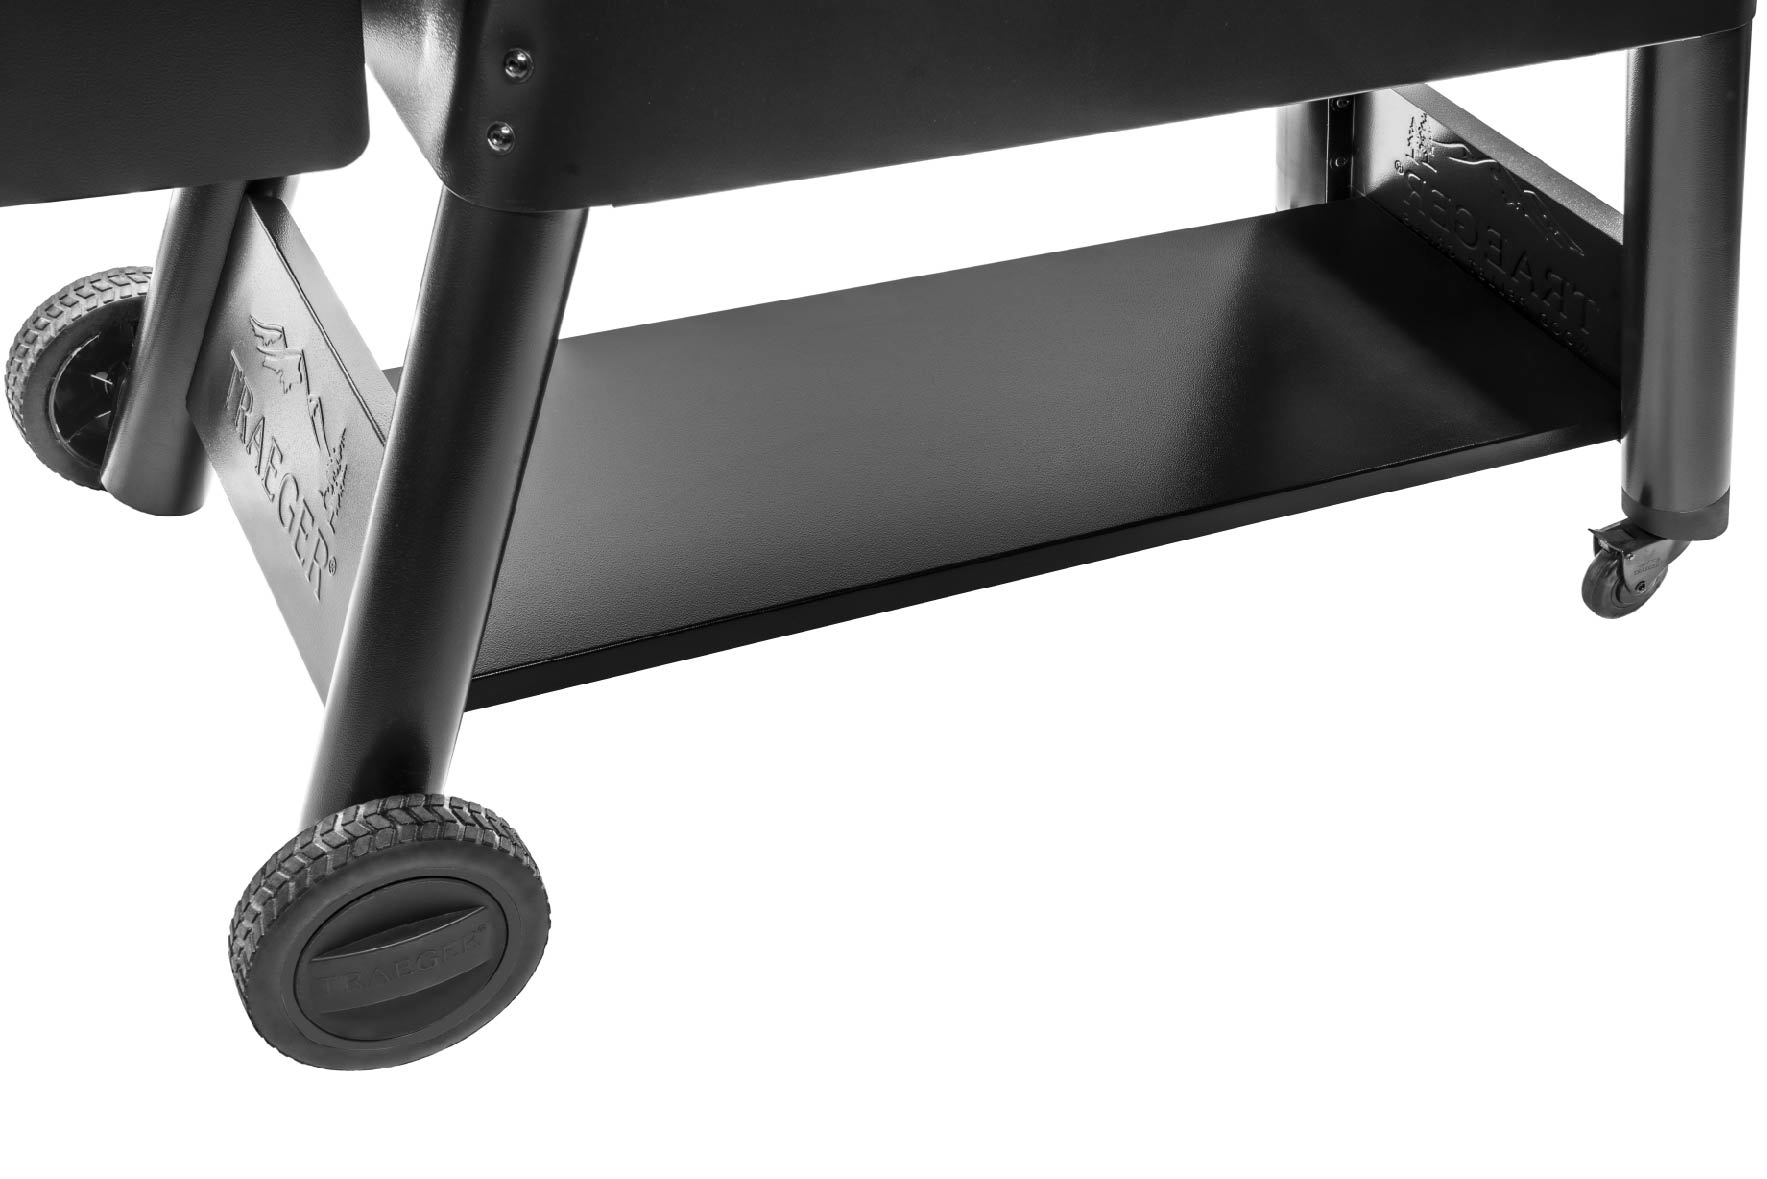 Pro Series 34 Bottom Shelf